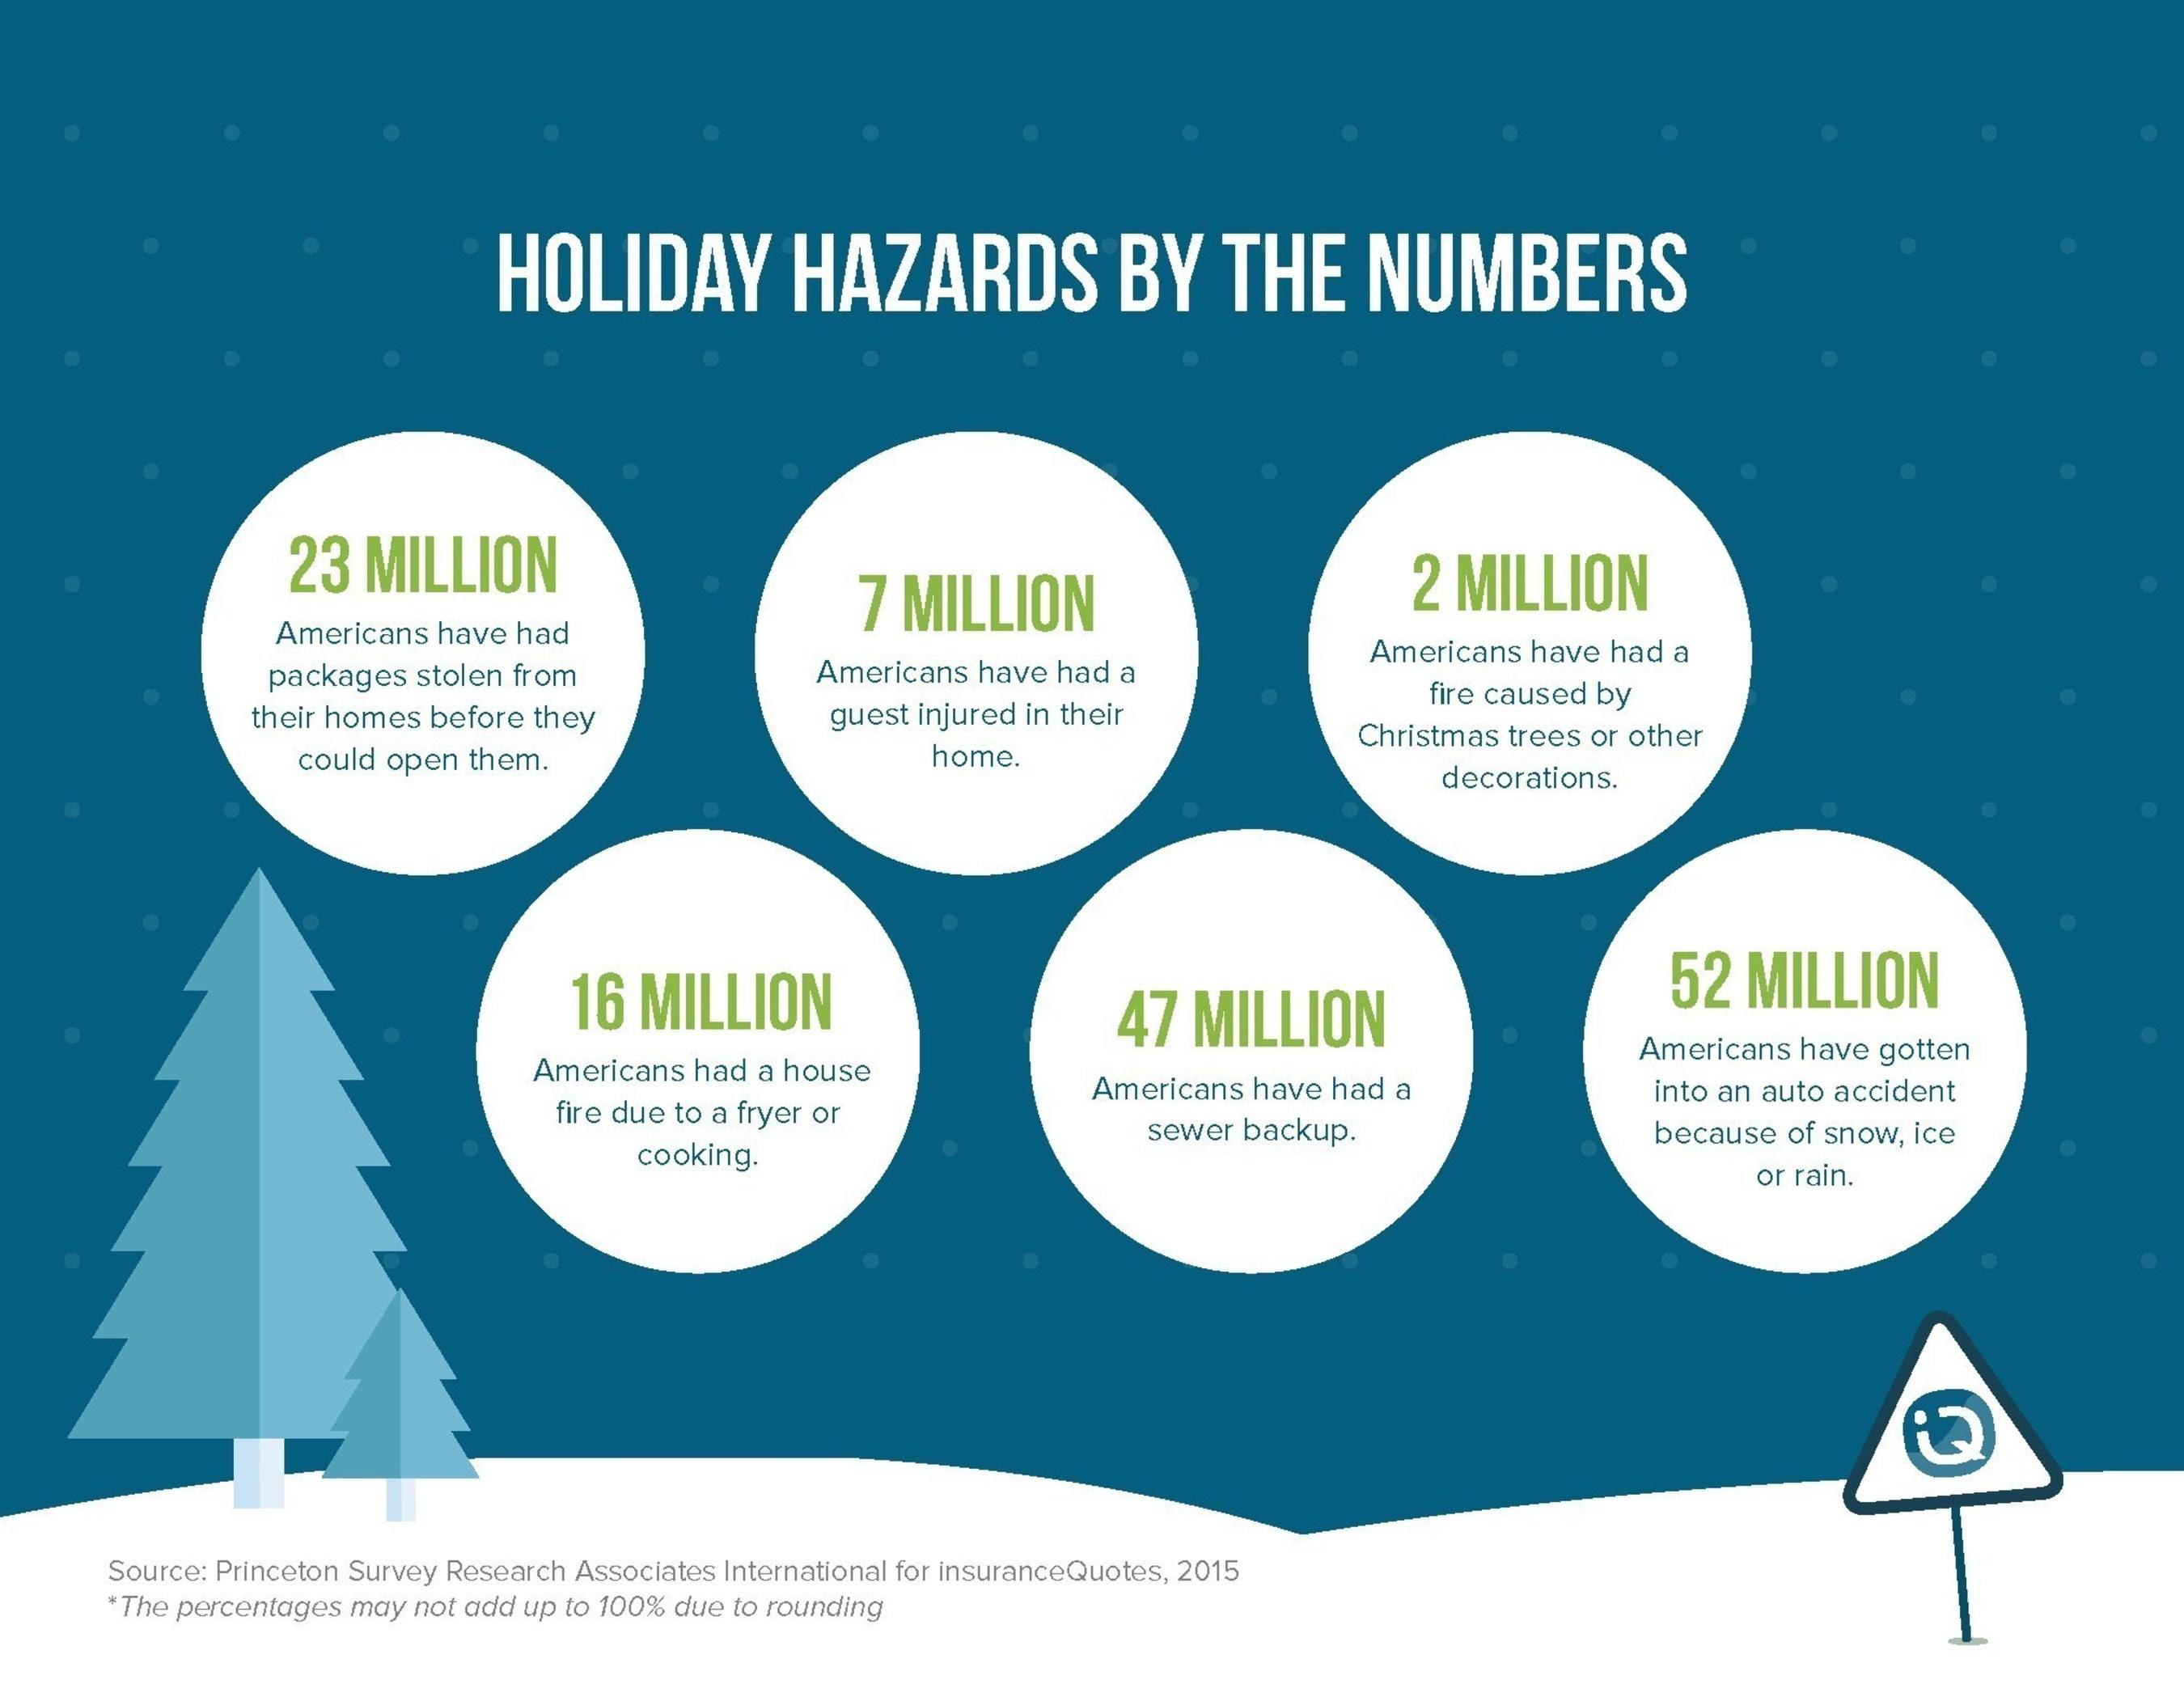 insuranceQuotes.com Holiday Hazards Survey - December 2015